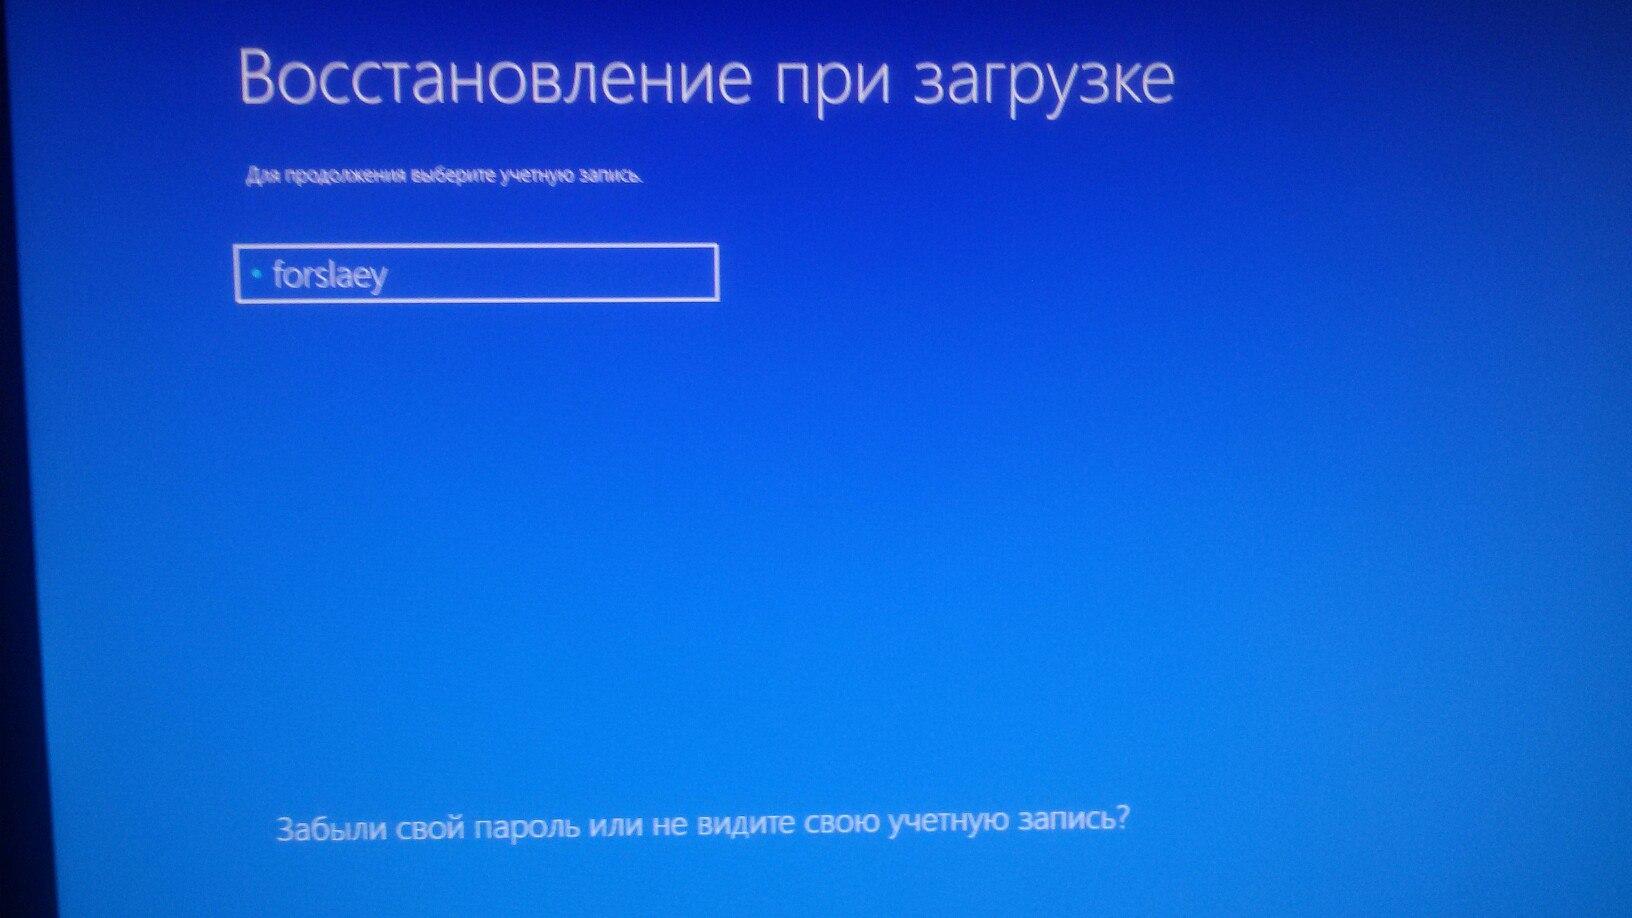 http://www.imageup.ru/img141/3032349/tnq92f1unje.jpg